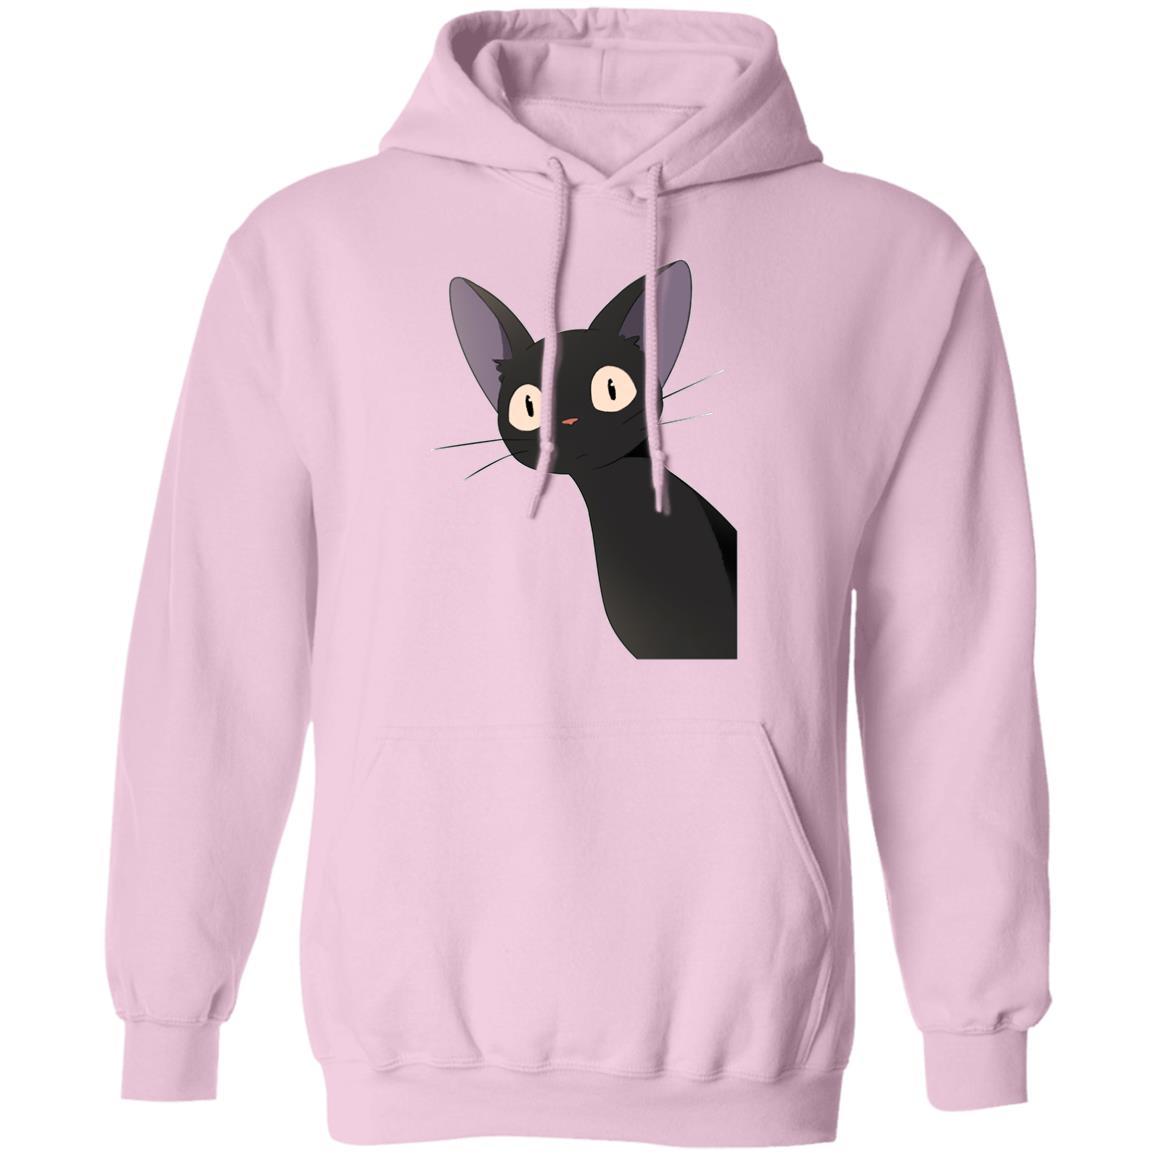 Kiki's Delivery Service  – Jiji Style 1 Hoodie